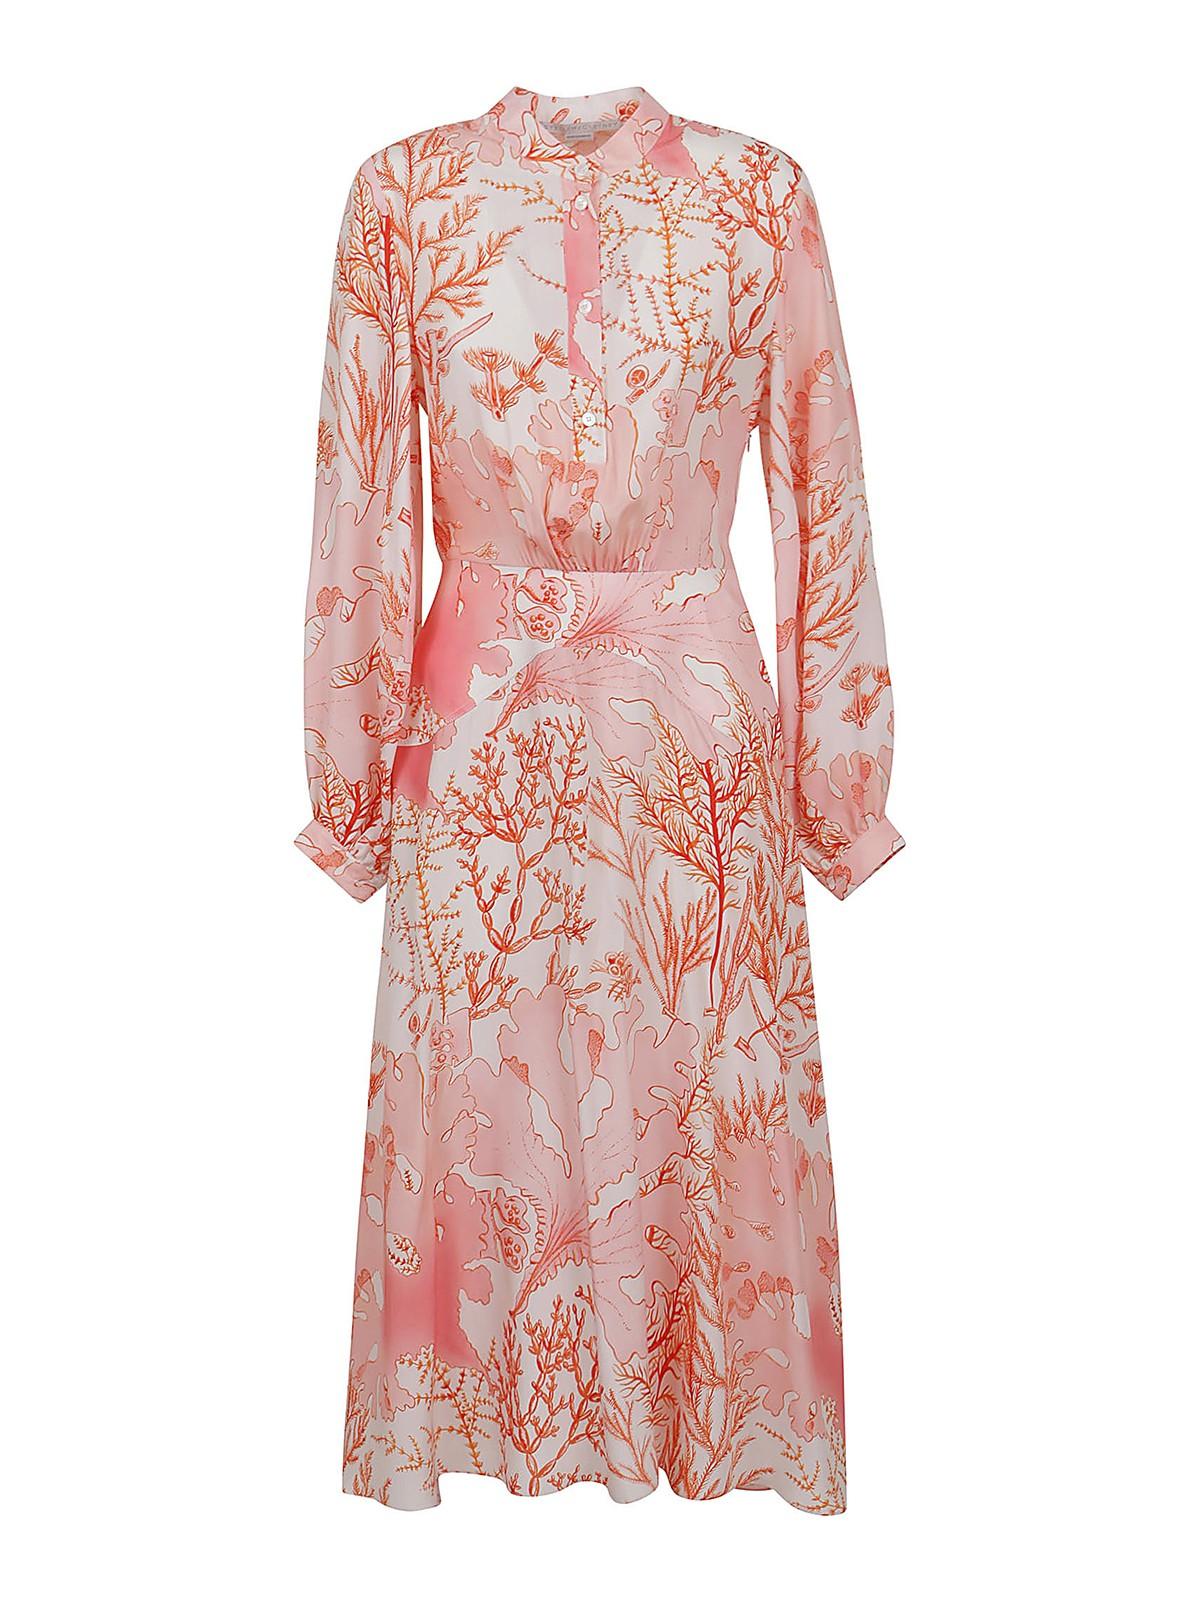 Stella Mccartney Clothing ALYSSA SILK DRESS